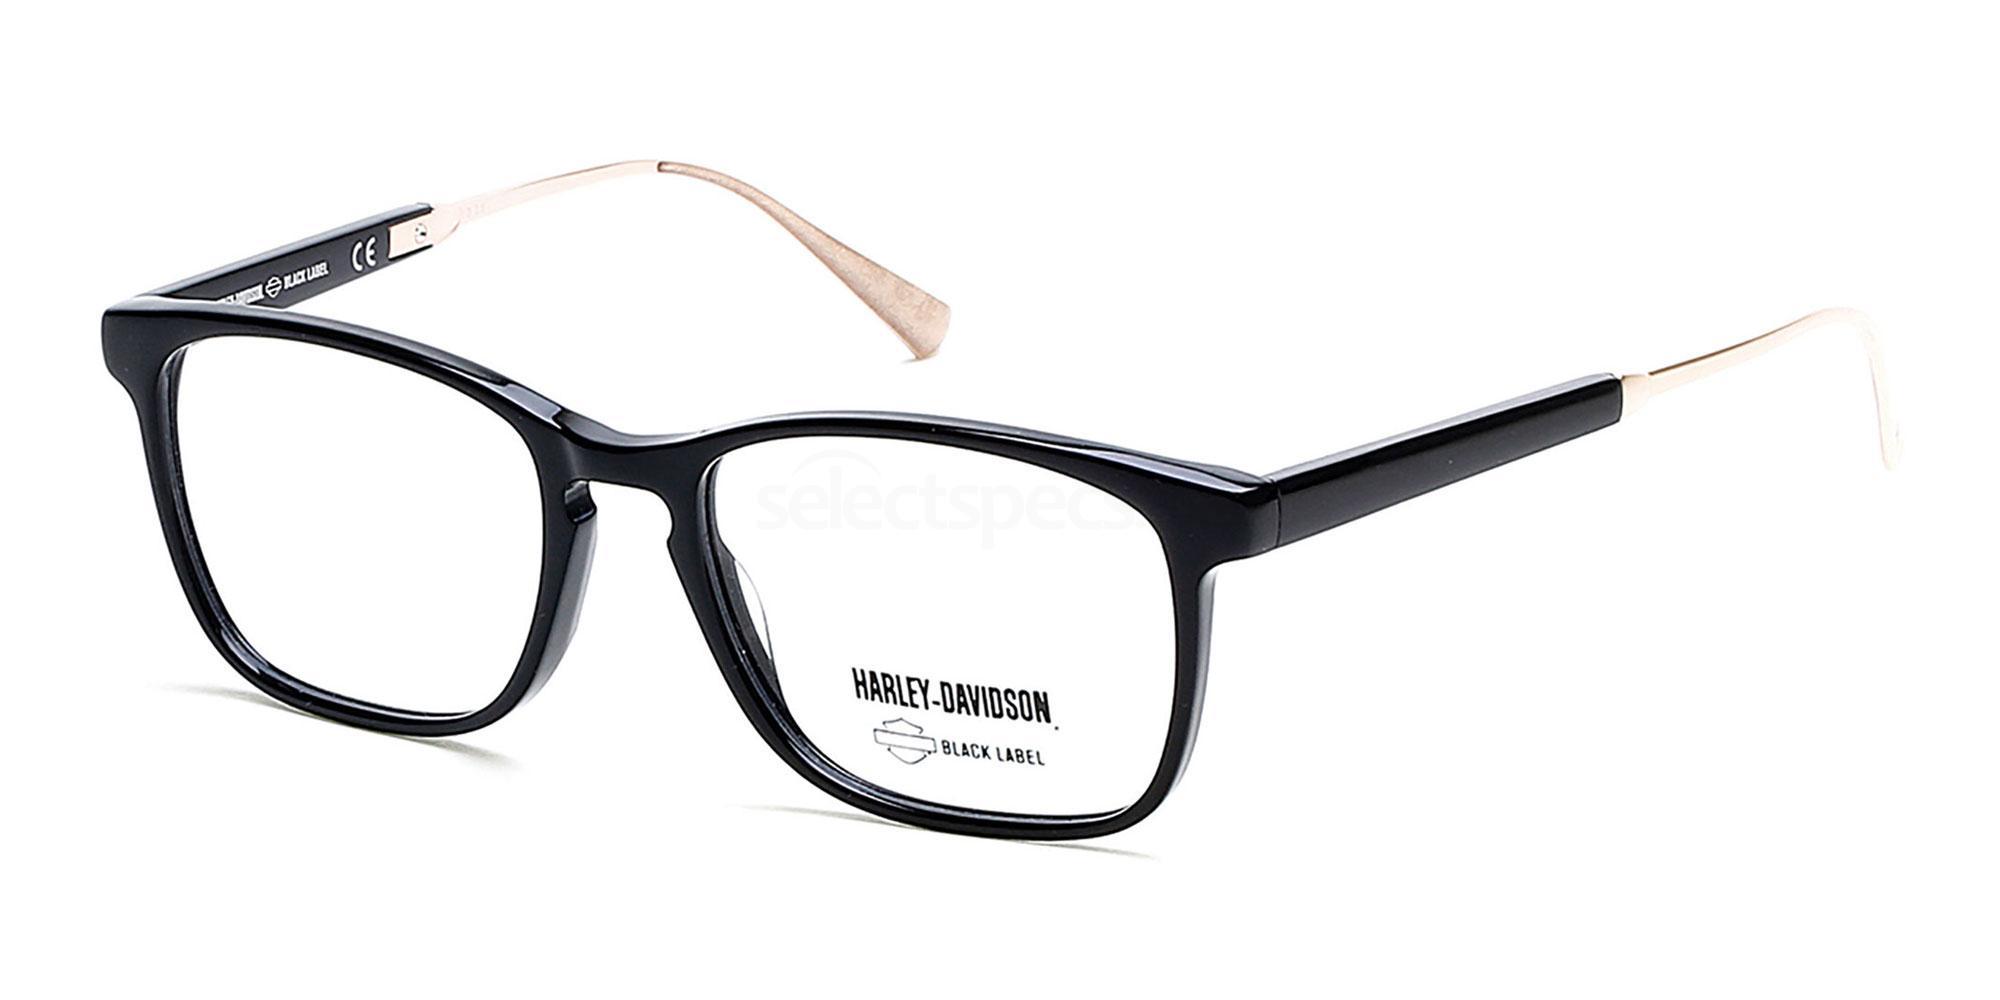 001 HD 1027 Glasses, Harley Davidson